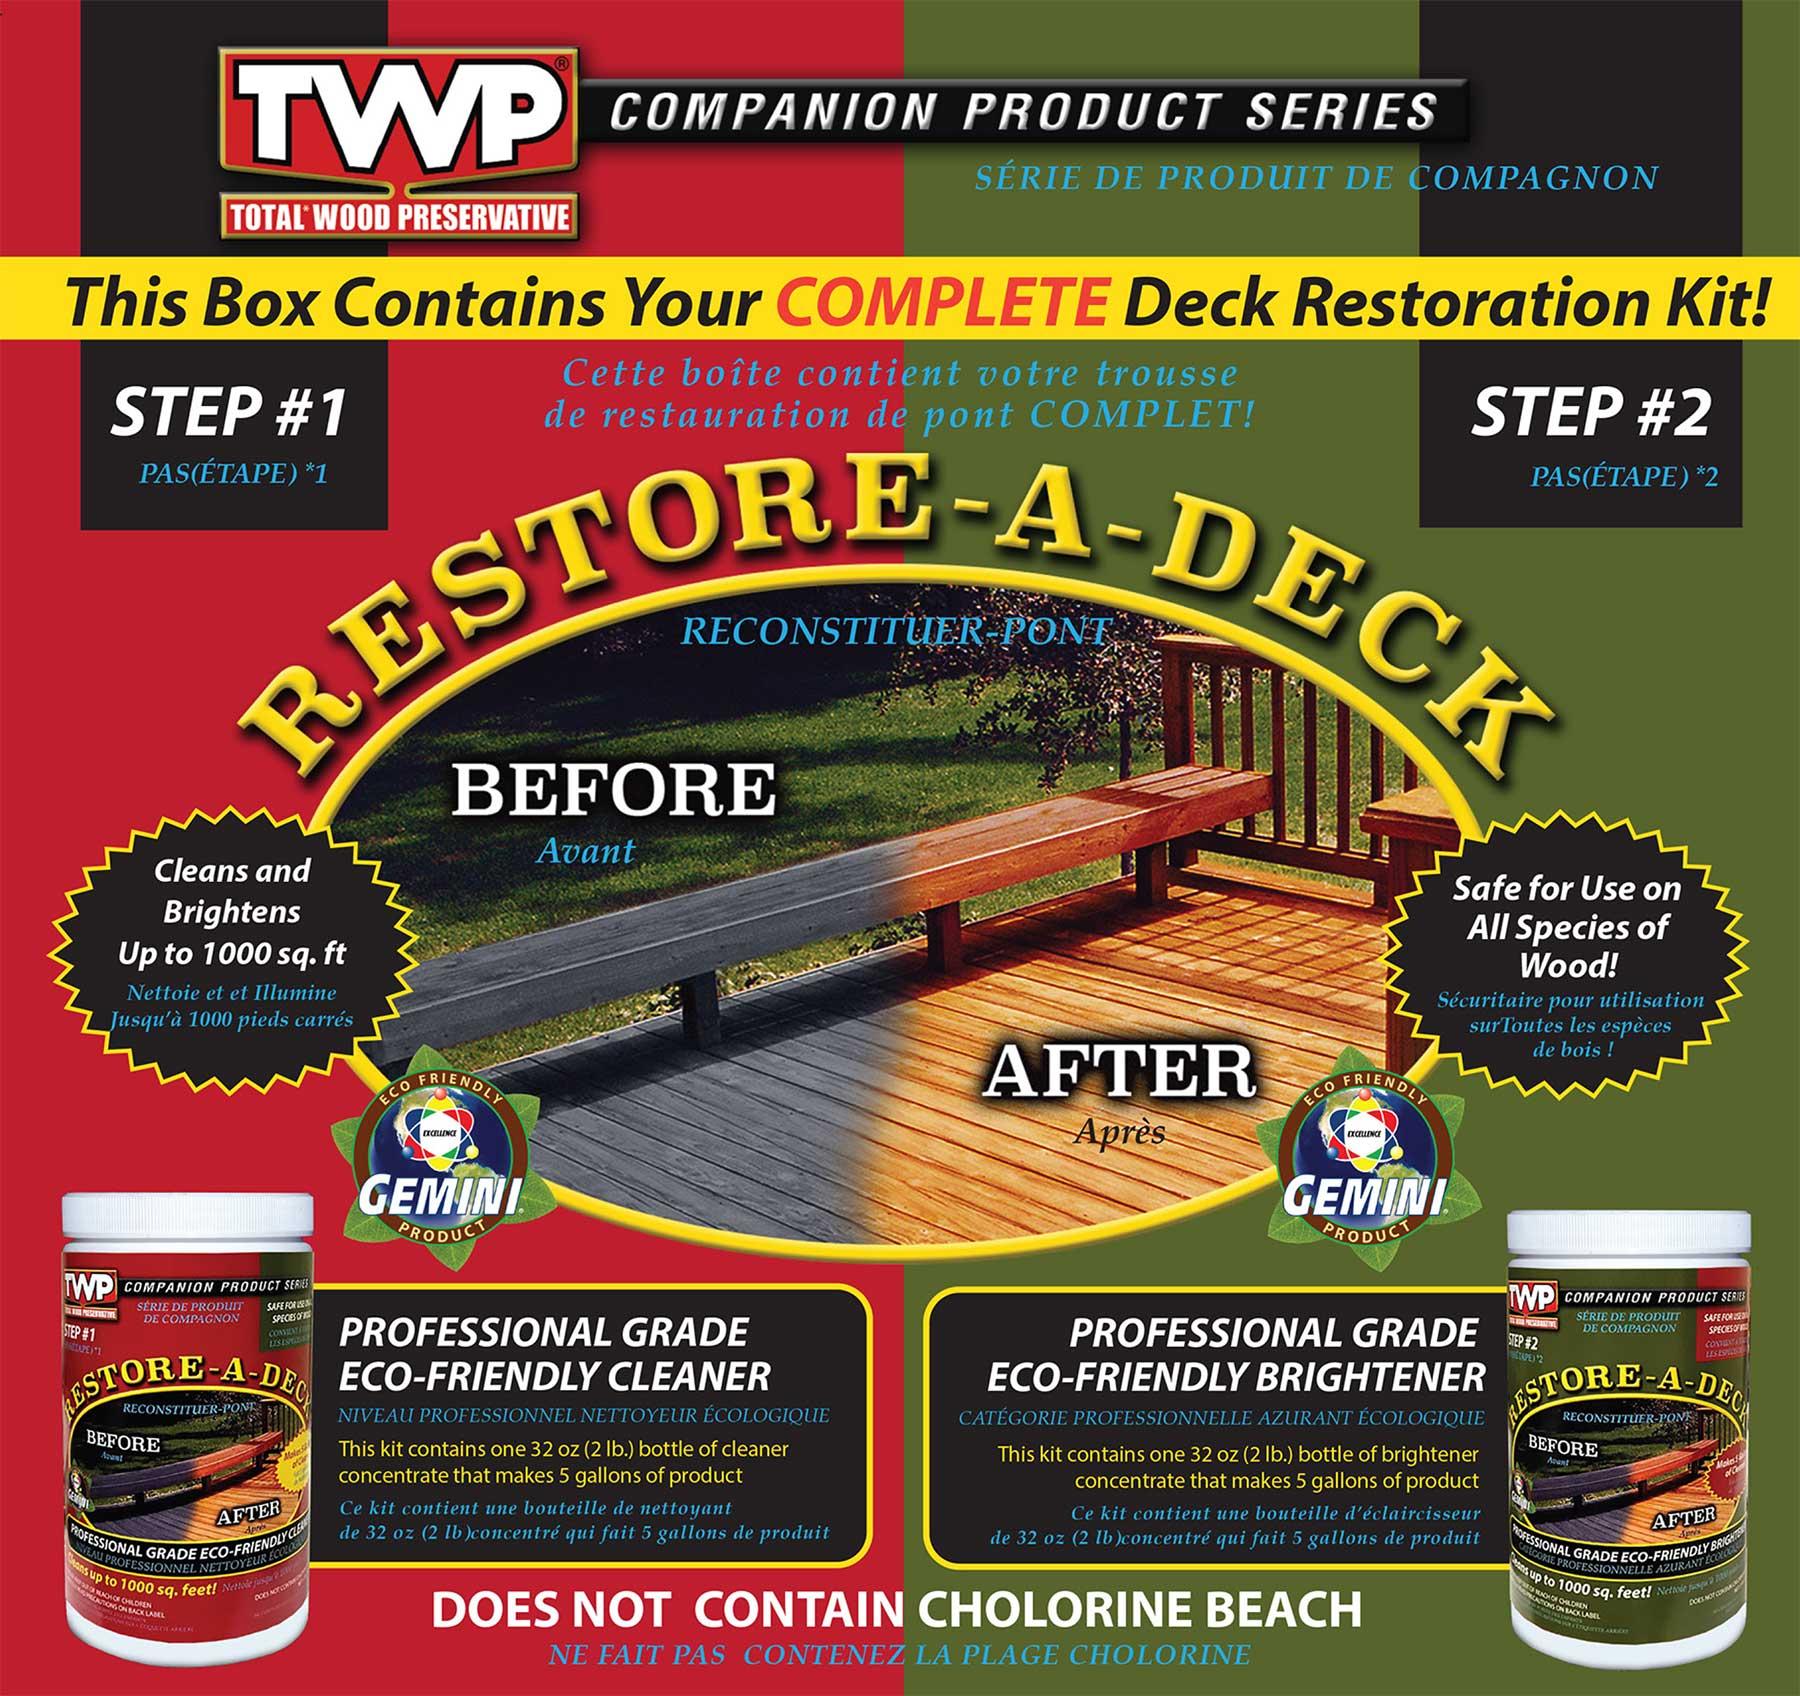 gemini restore a deck kit instructions